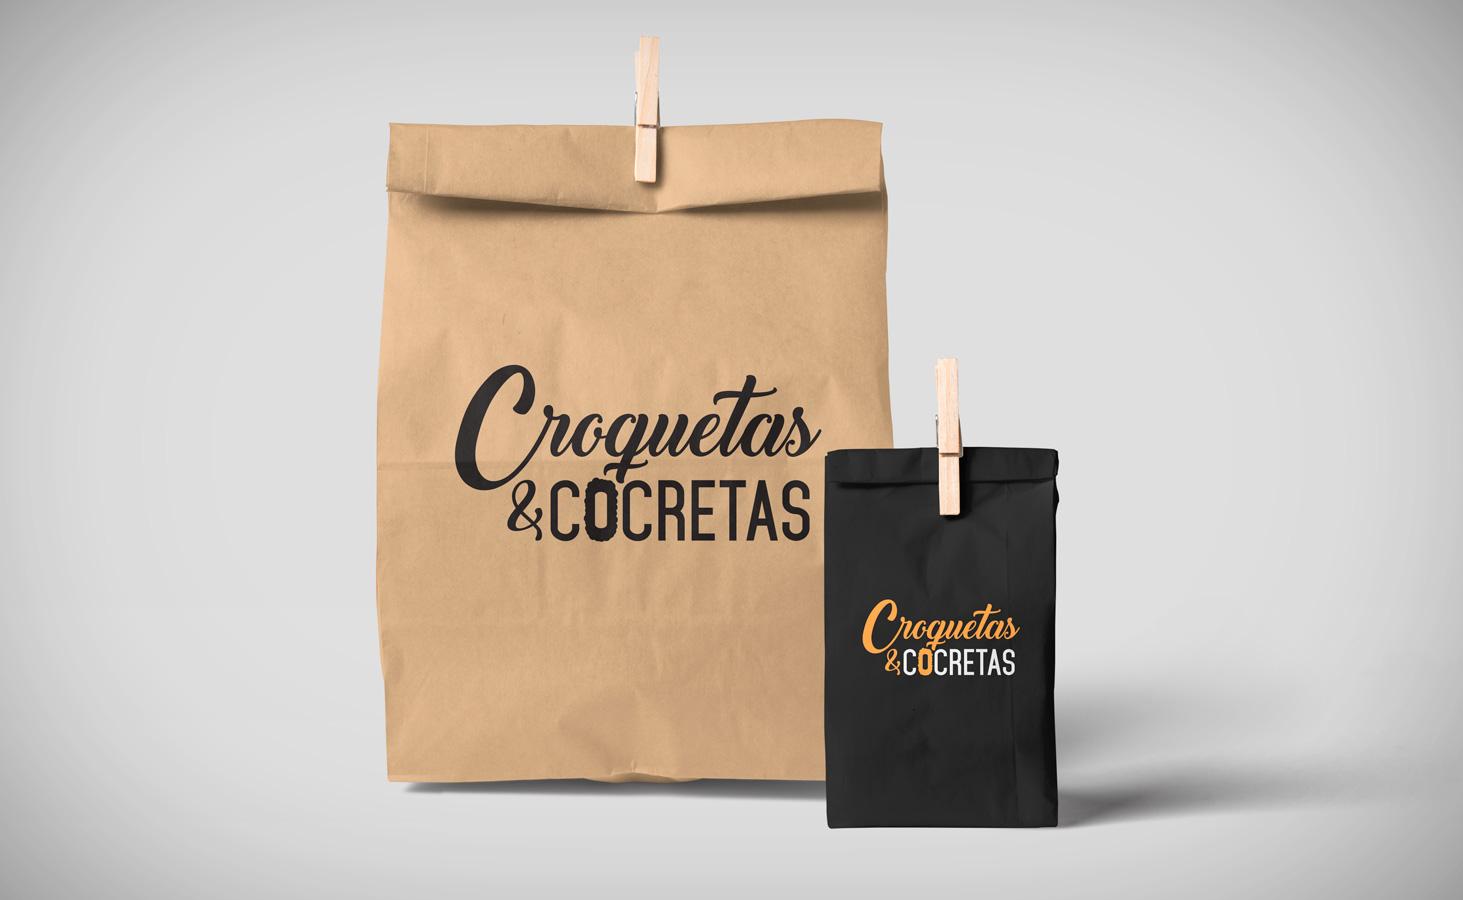 croquetas_imagen9